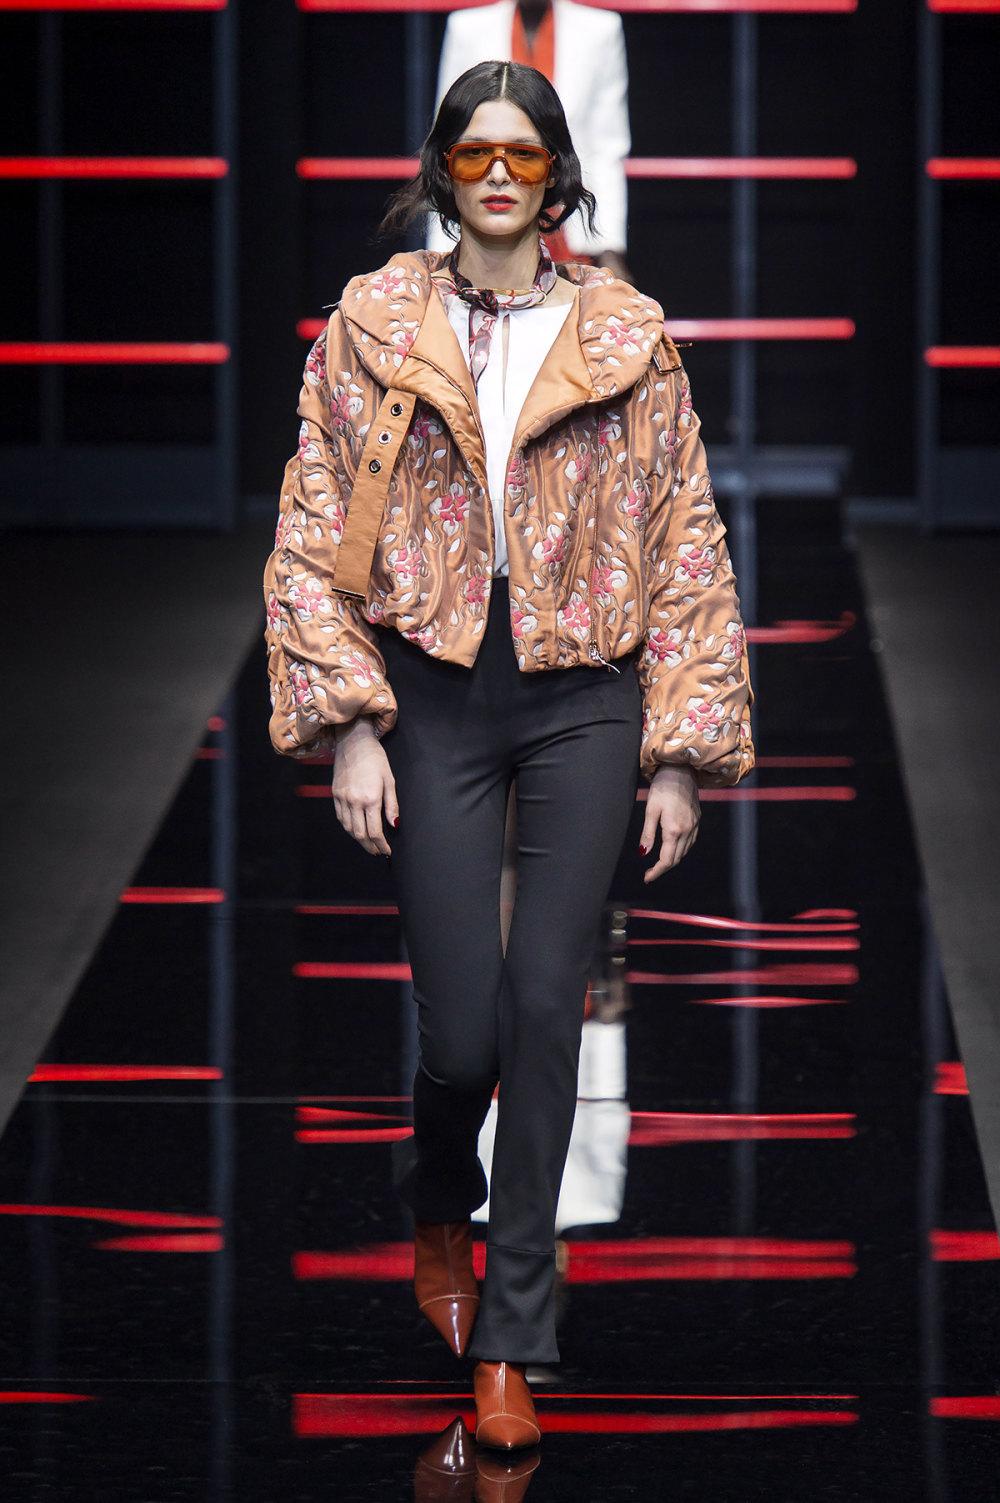 Emporio Armani时装系列畅的裤子带有柔滑裙子的鸡尾酒礼服-3.jpg